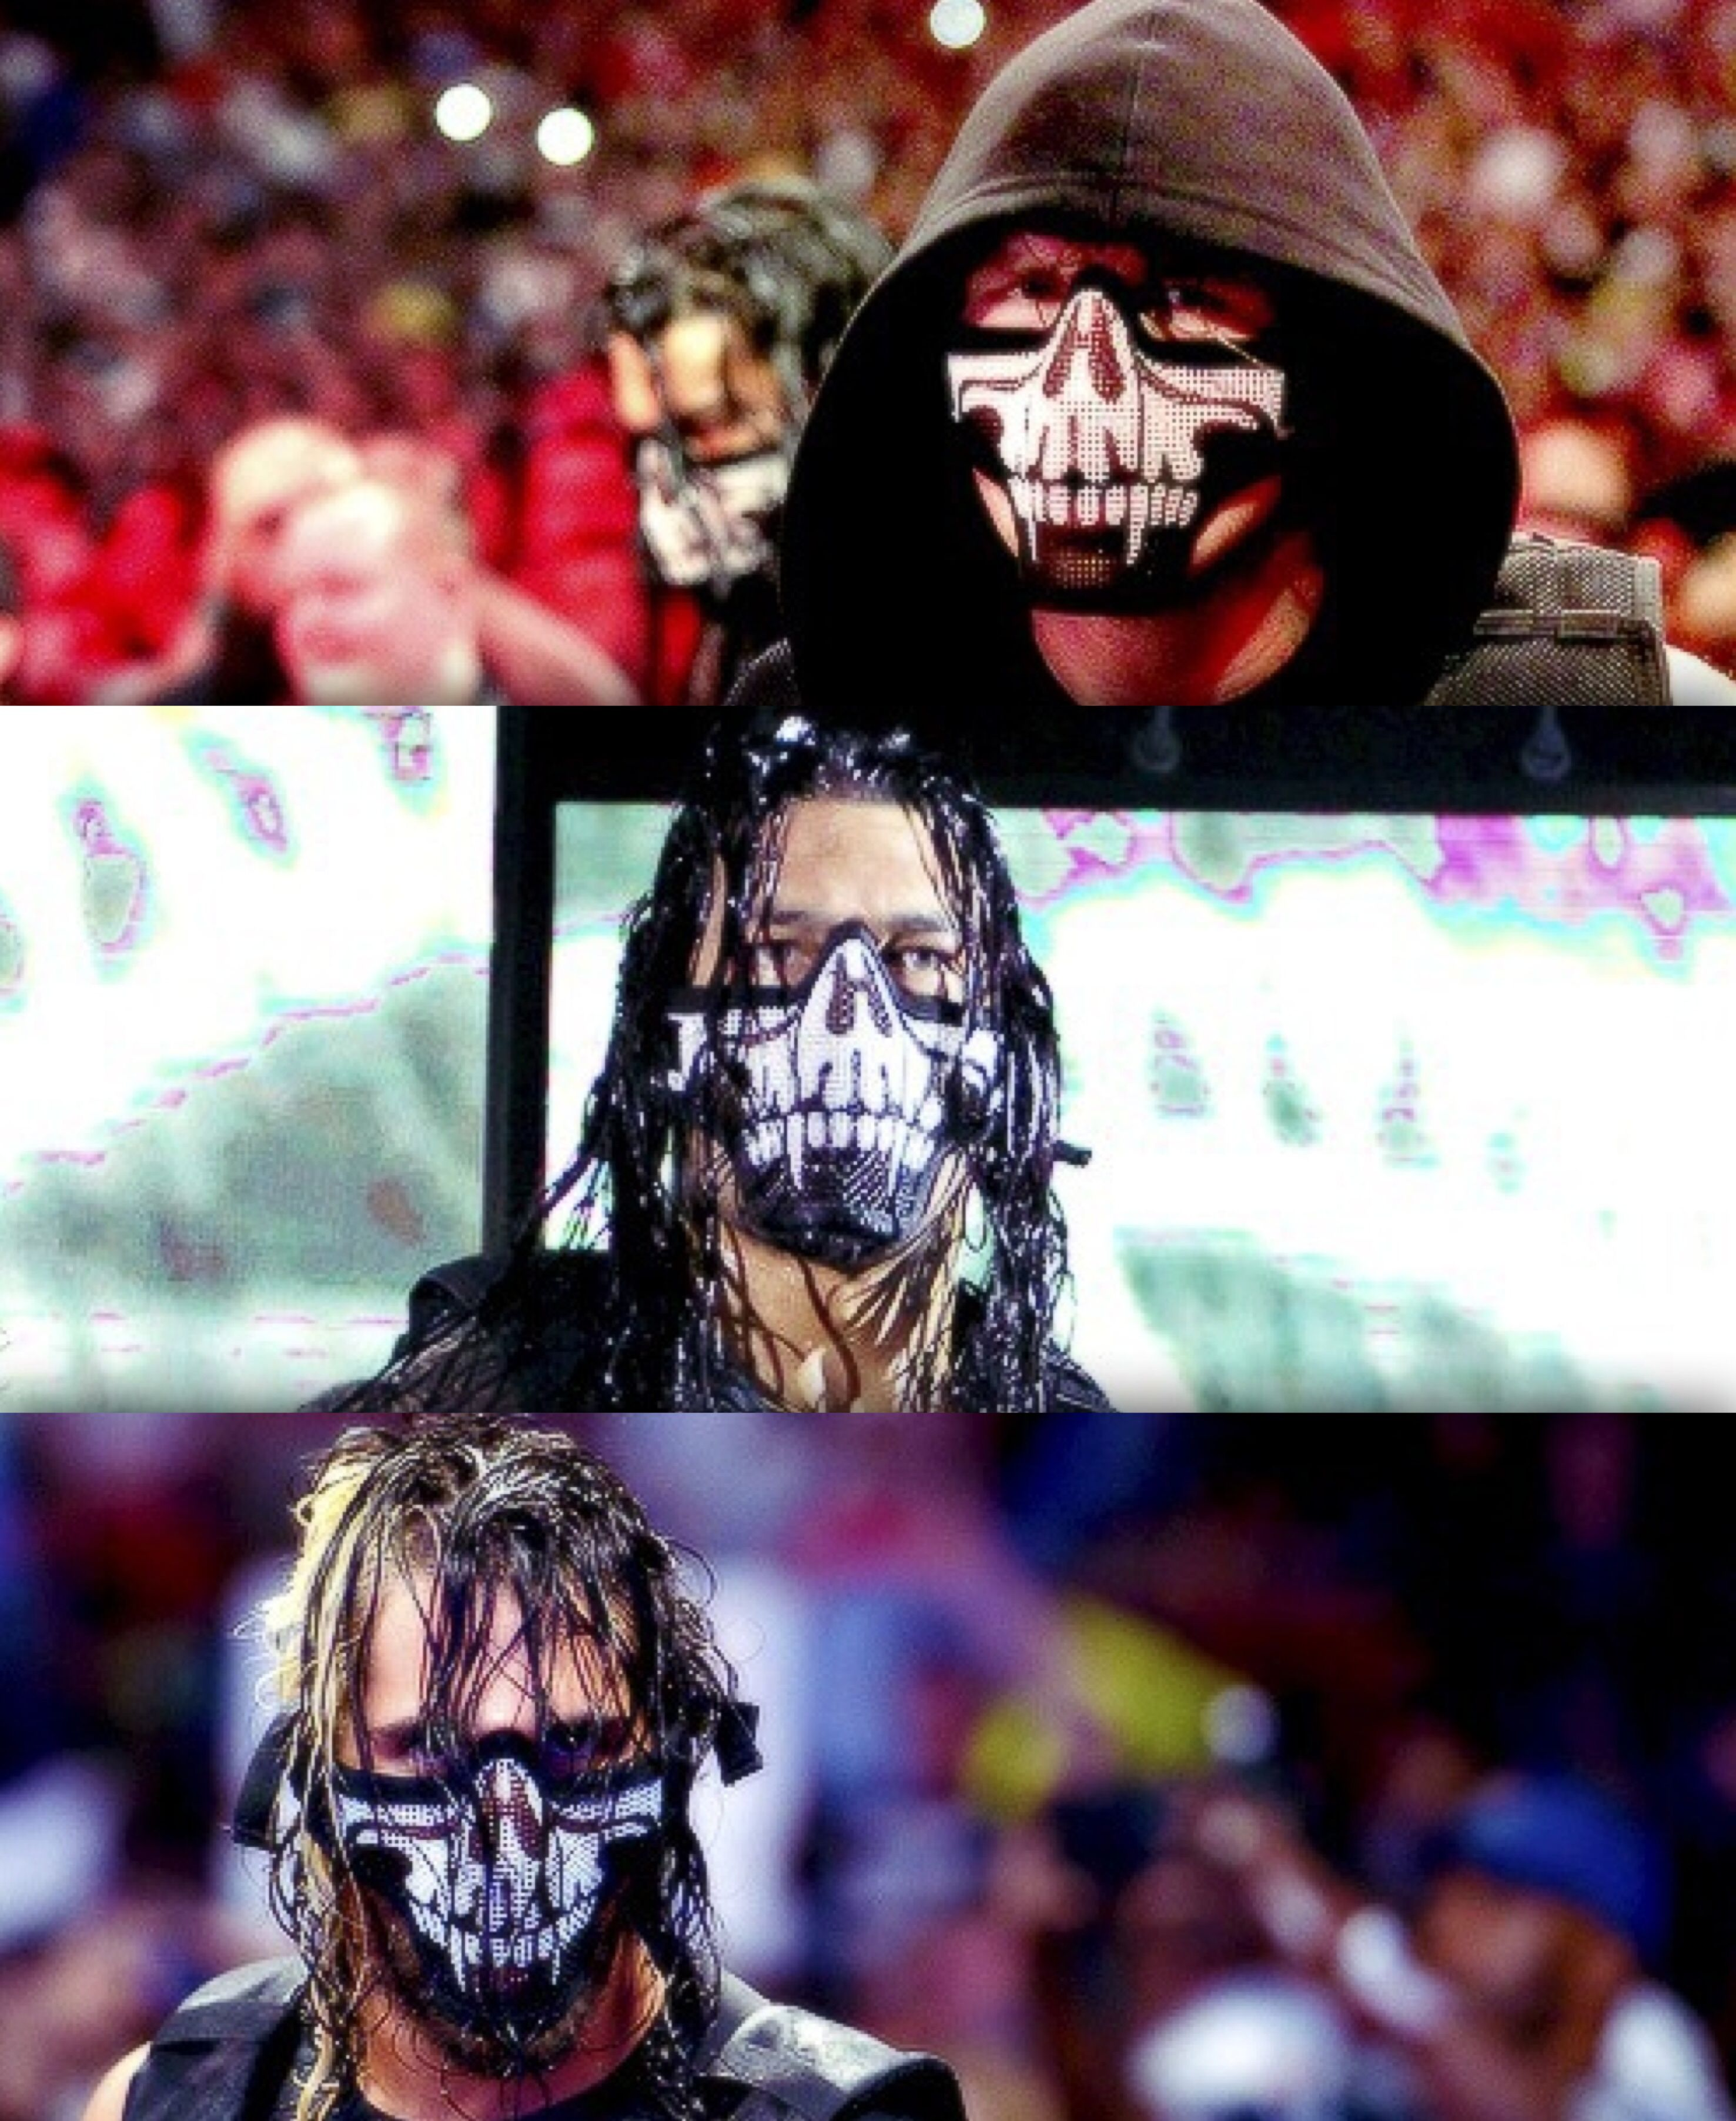 The Shield Rockin Their WrestleMania 30 Masks